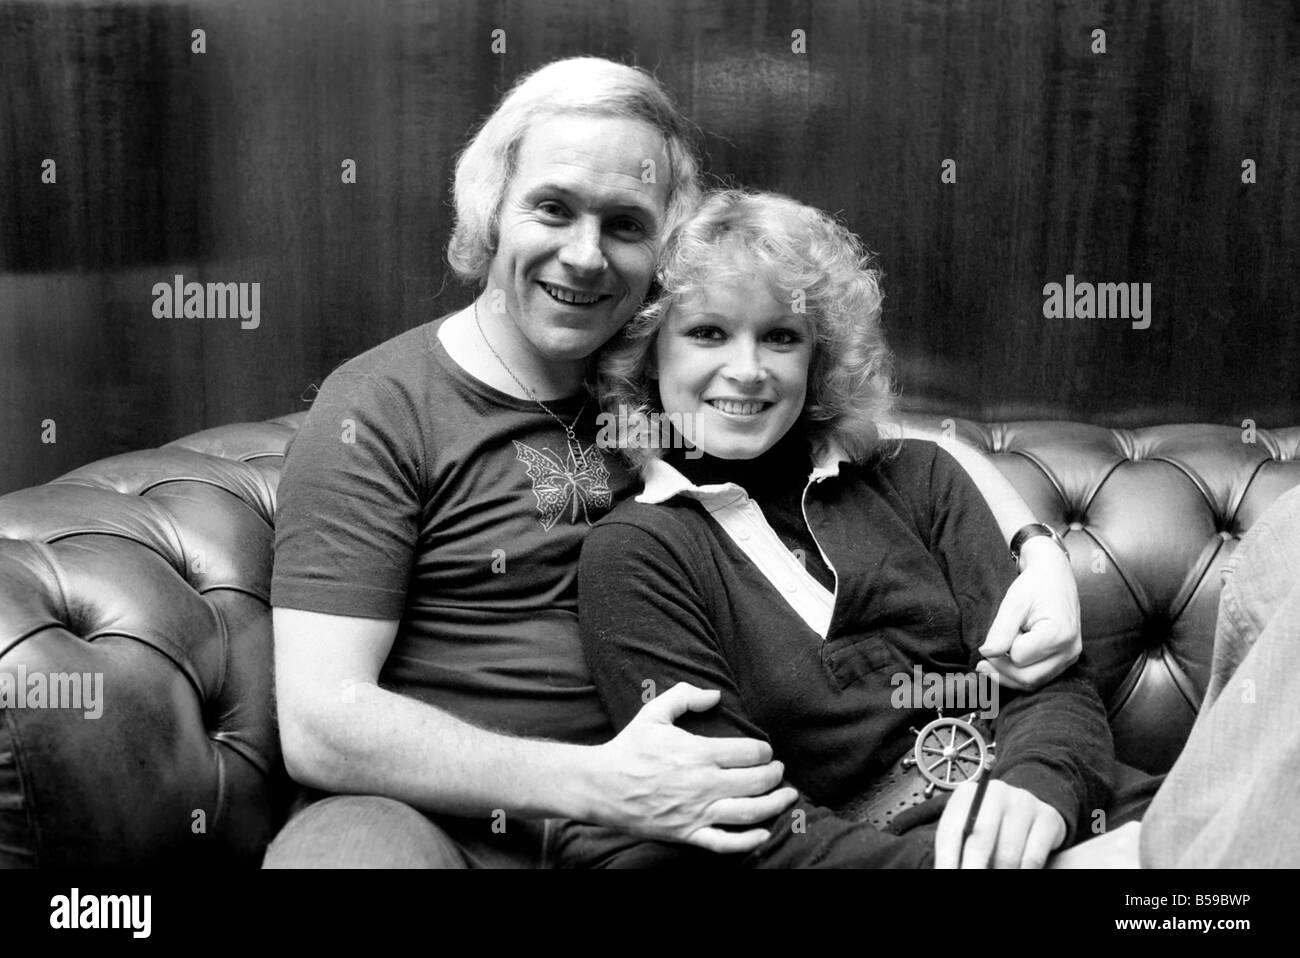 david hamilton D.J. David Hamilton (33) and girlfriend Angela Downing (21). April 1975